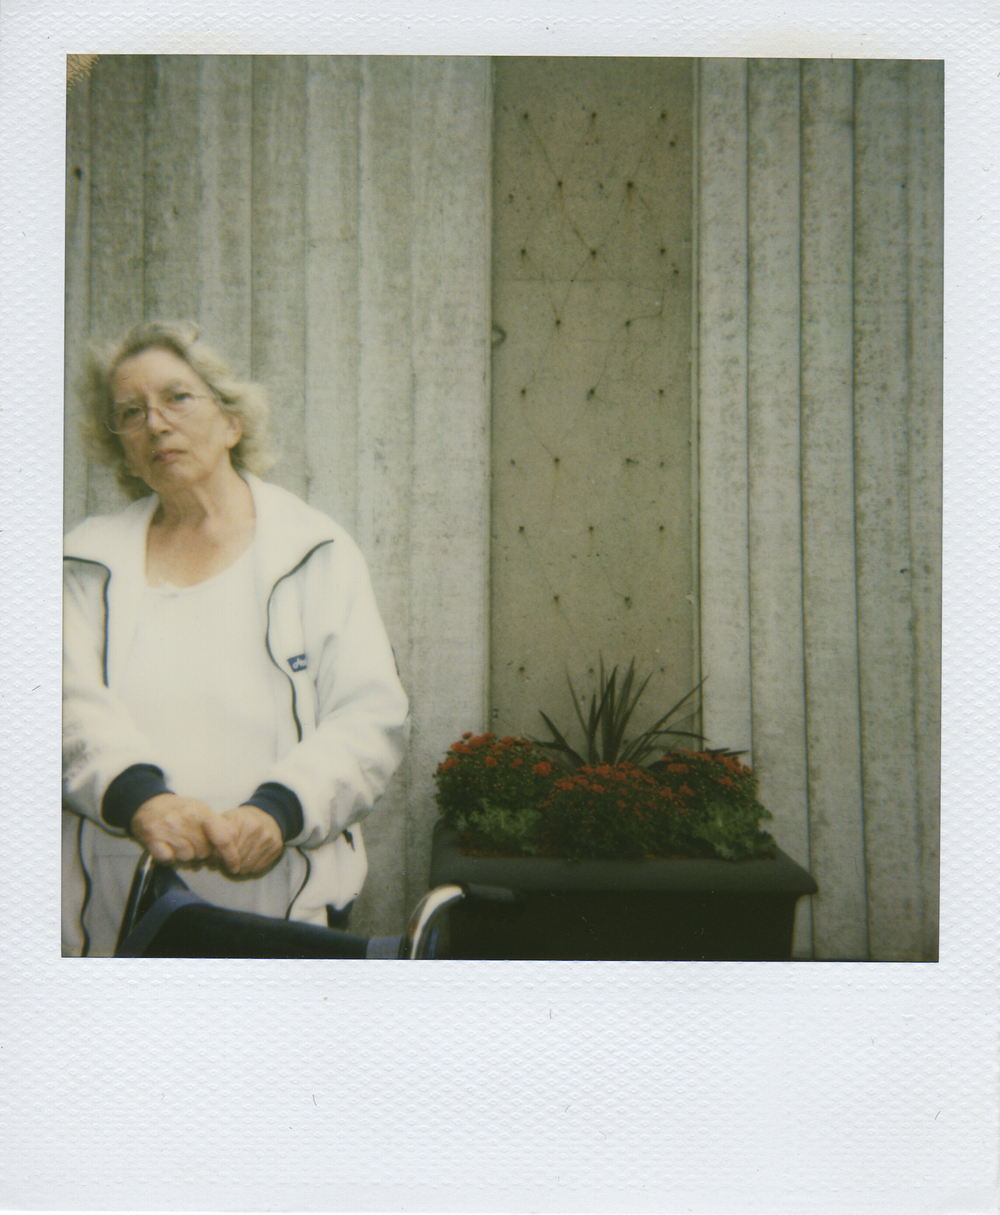 jlaurence-polaroid-015.jpg